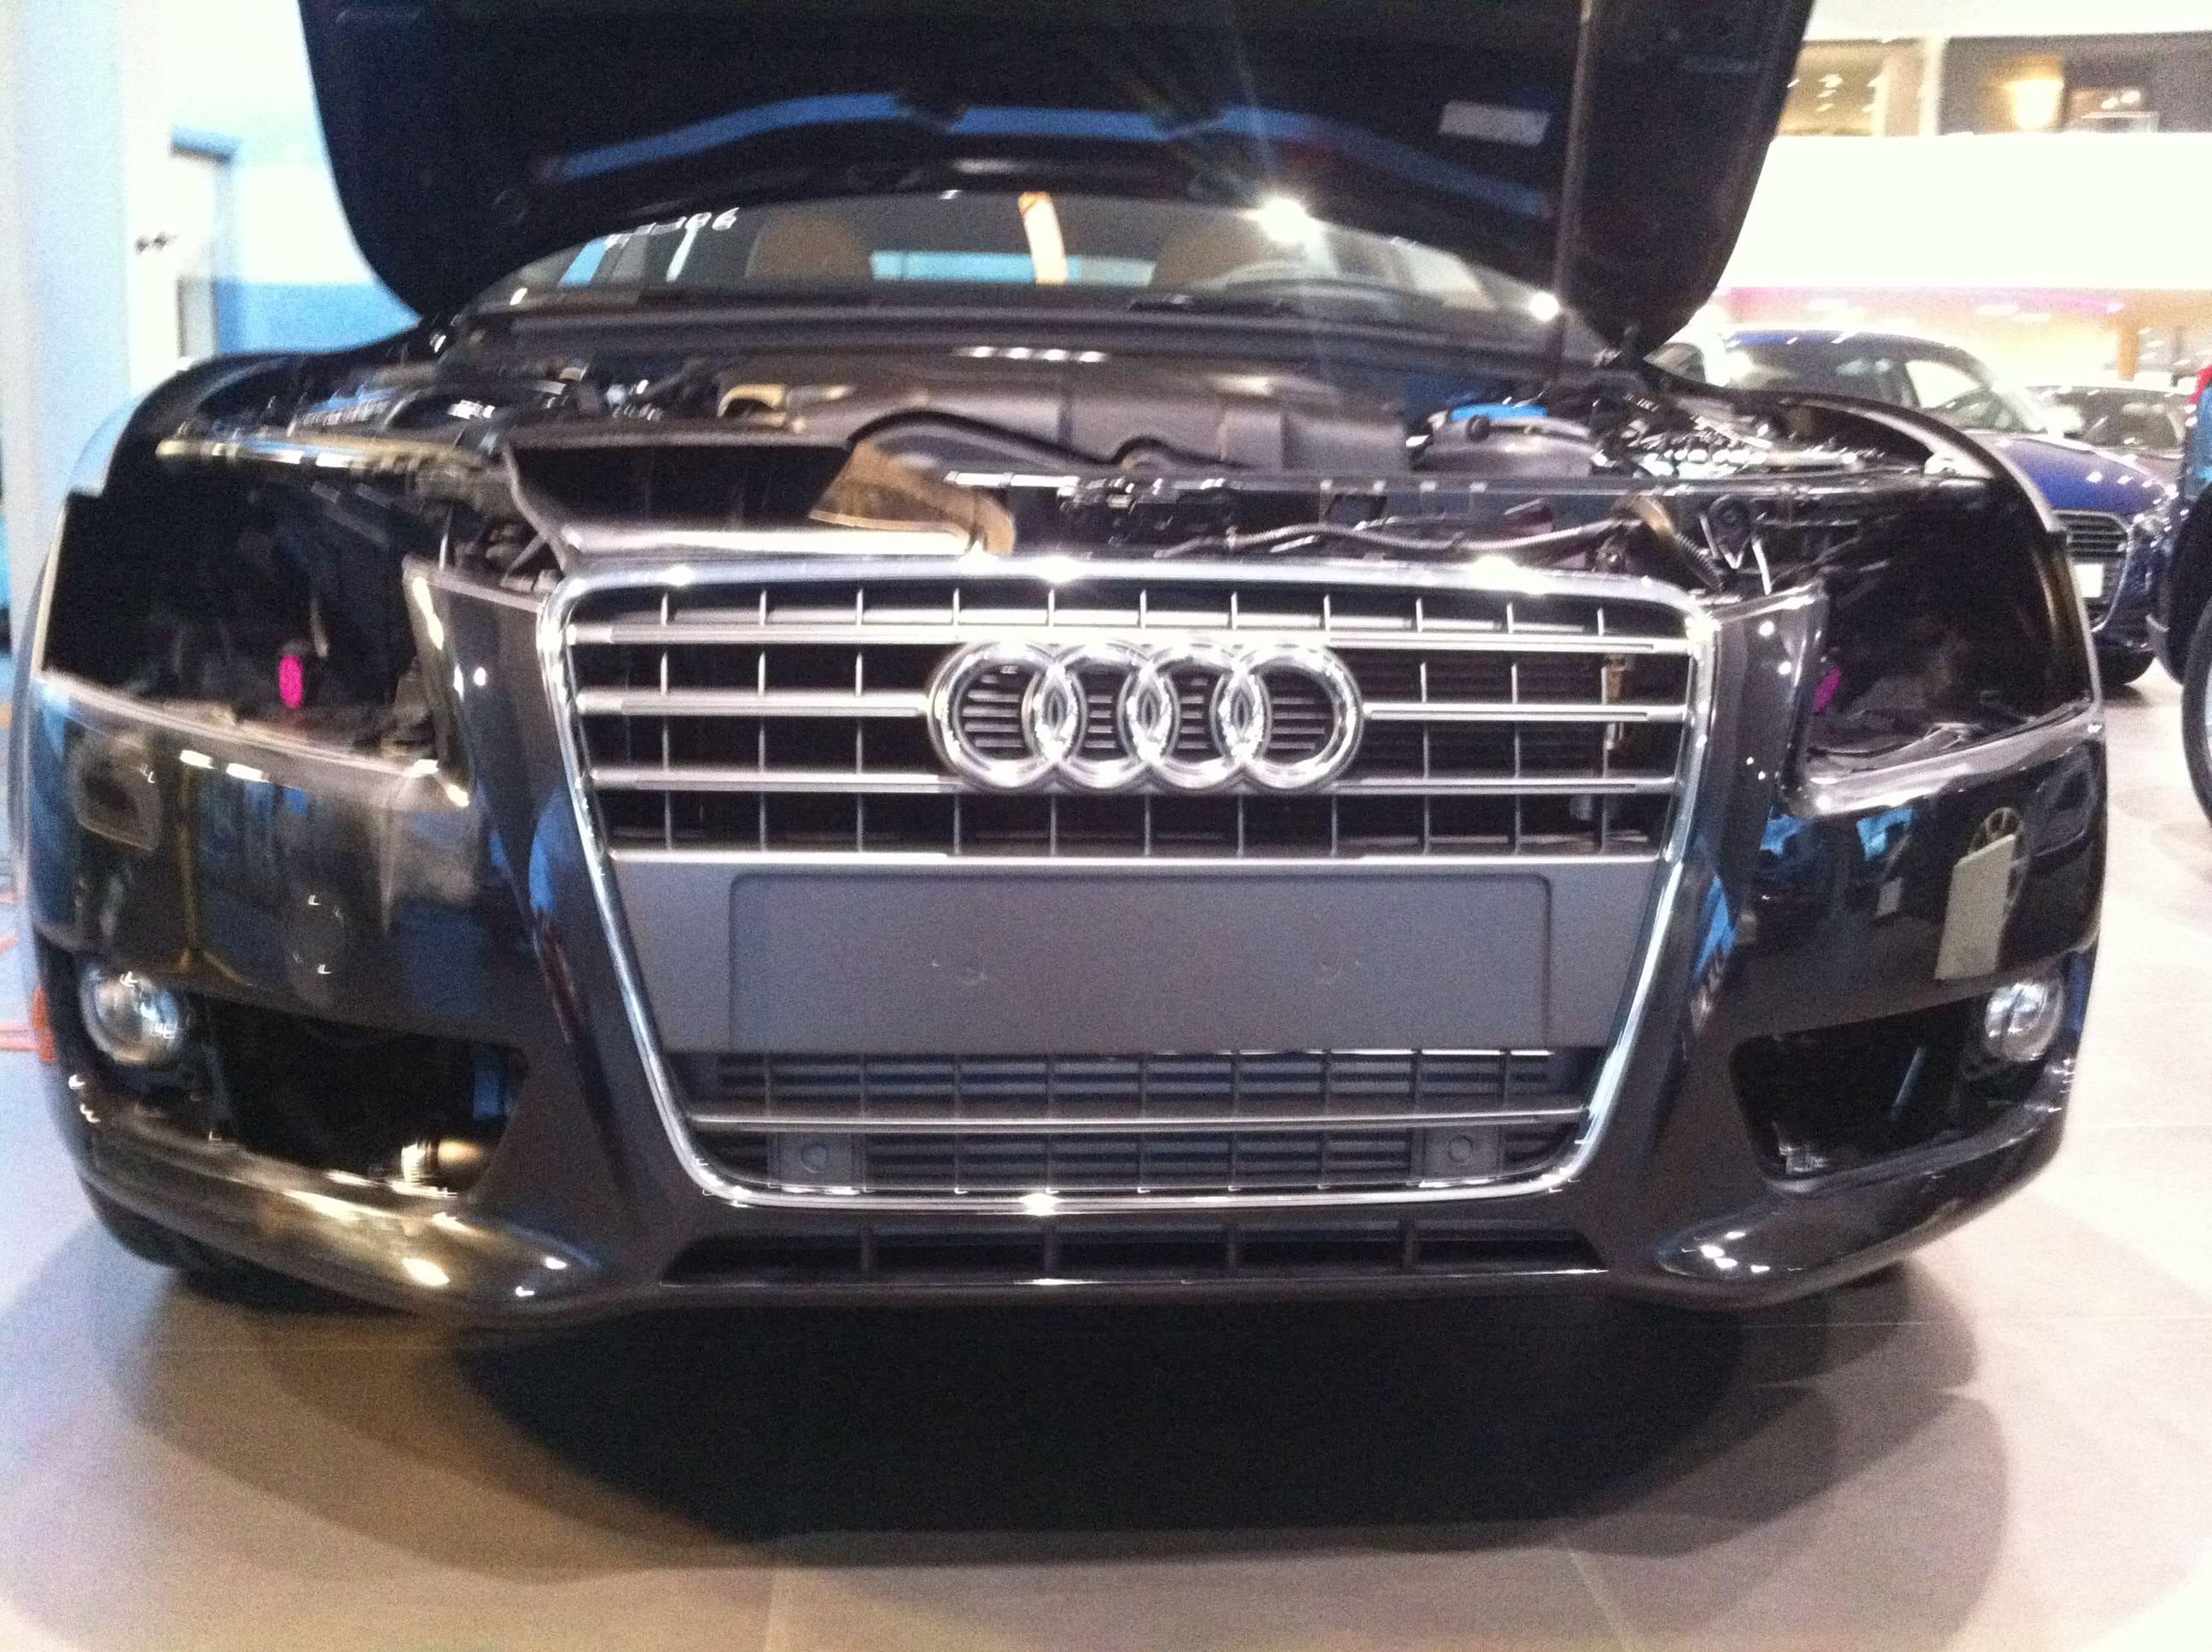 Audi A5 Sportback met Mat Grijze Wrap, Carwrapping door Wrapmyride.nu Foto-nr:4769, ©2021